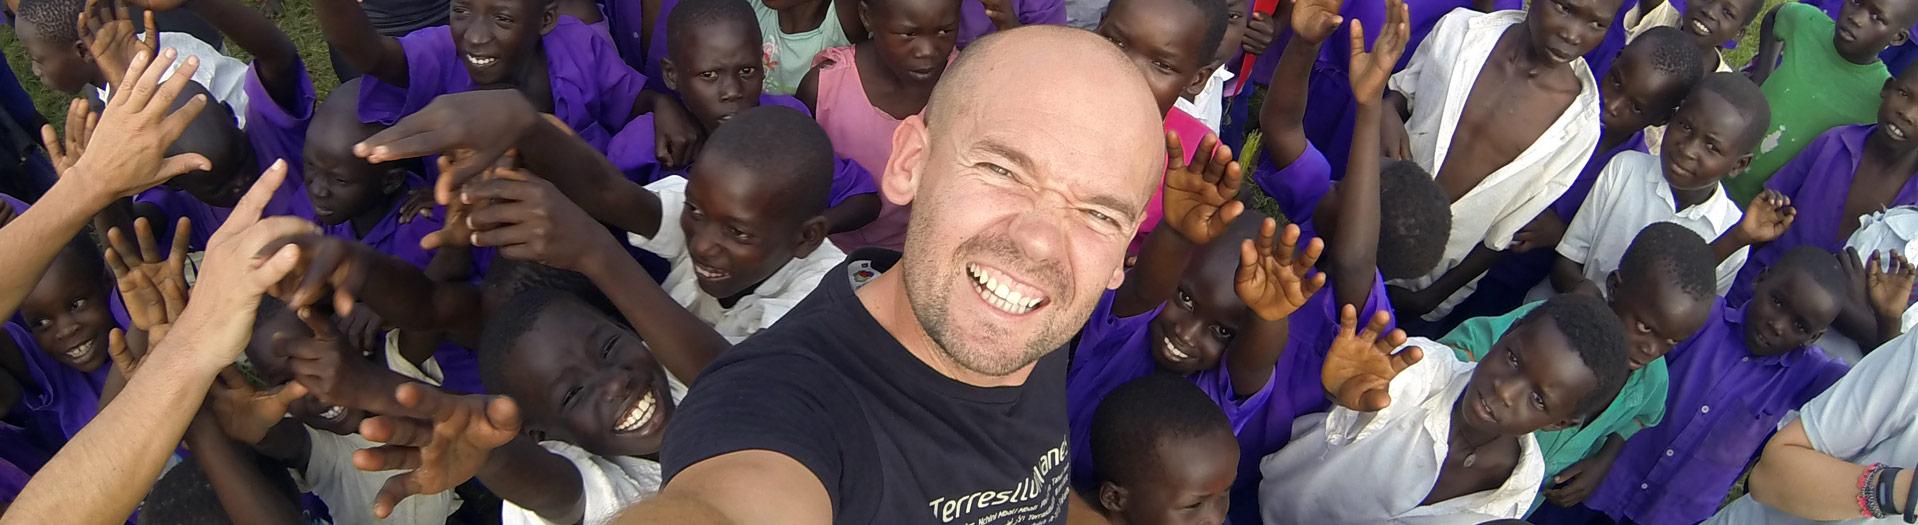 Manel_Uganda_Terres